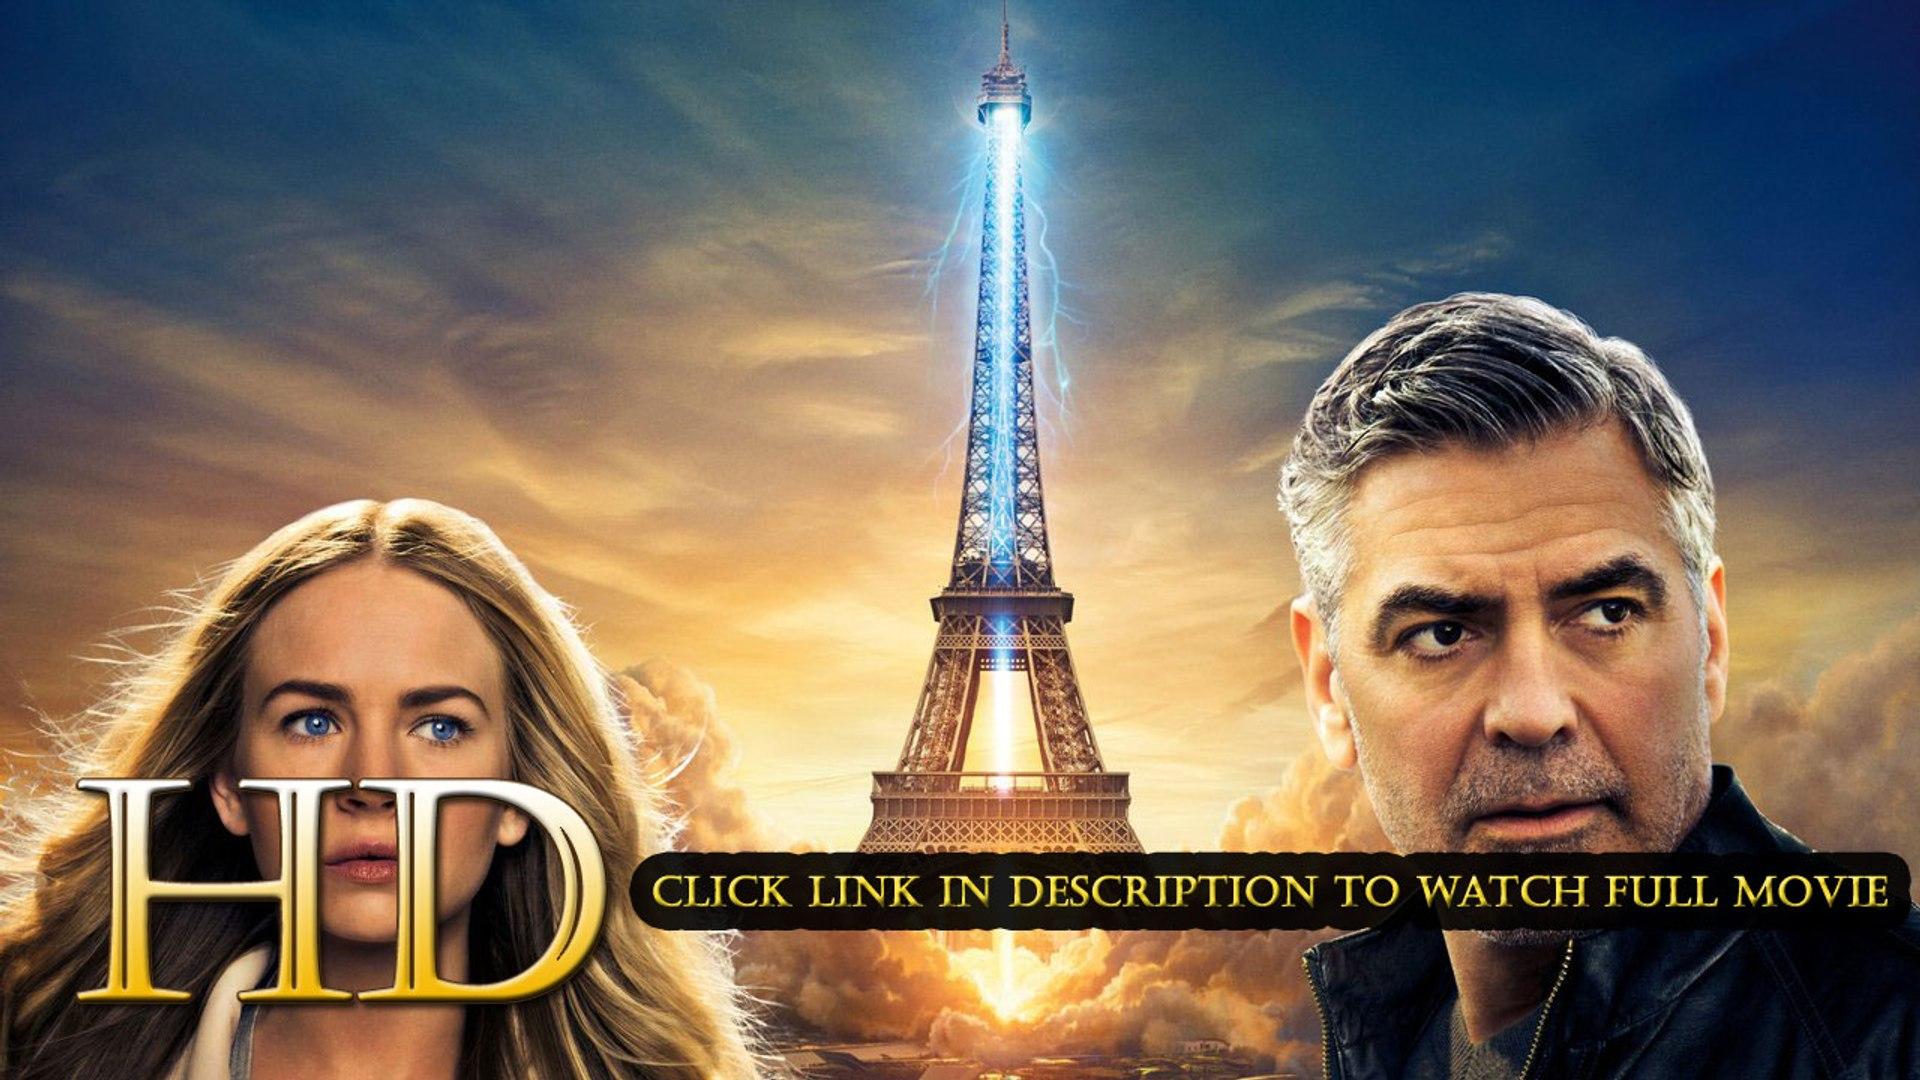 Tomorrowland 2015 Regarder film complet en français gratuit en streaming